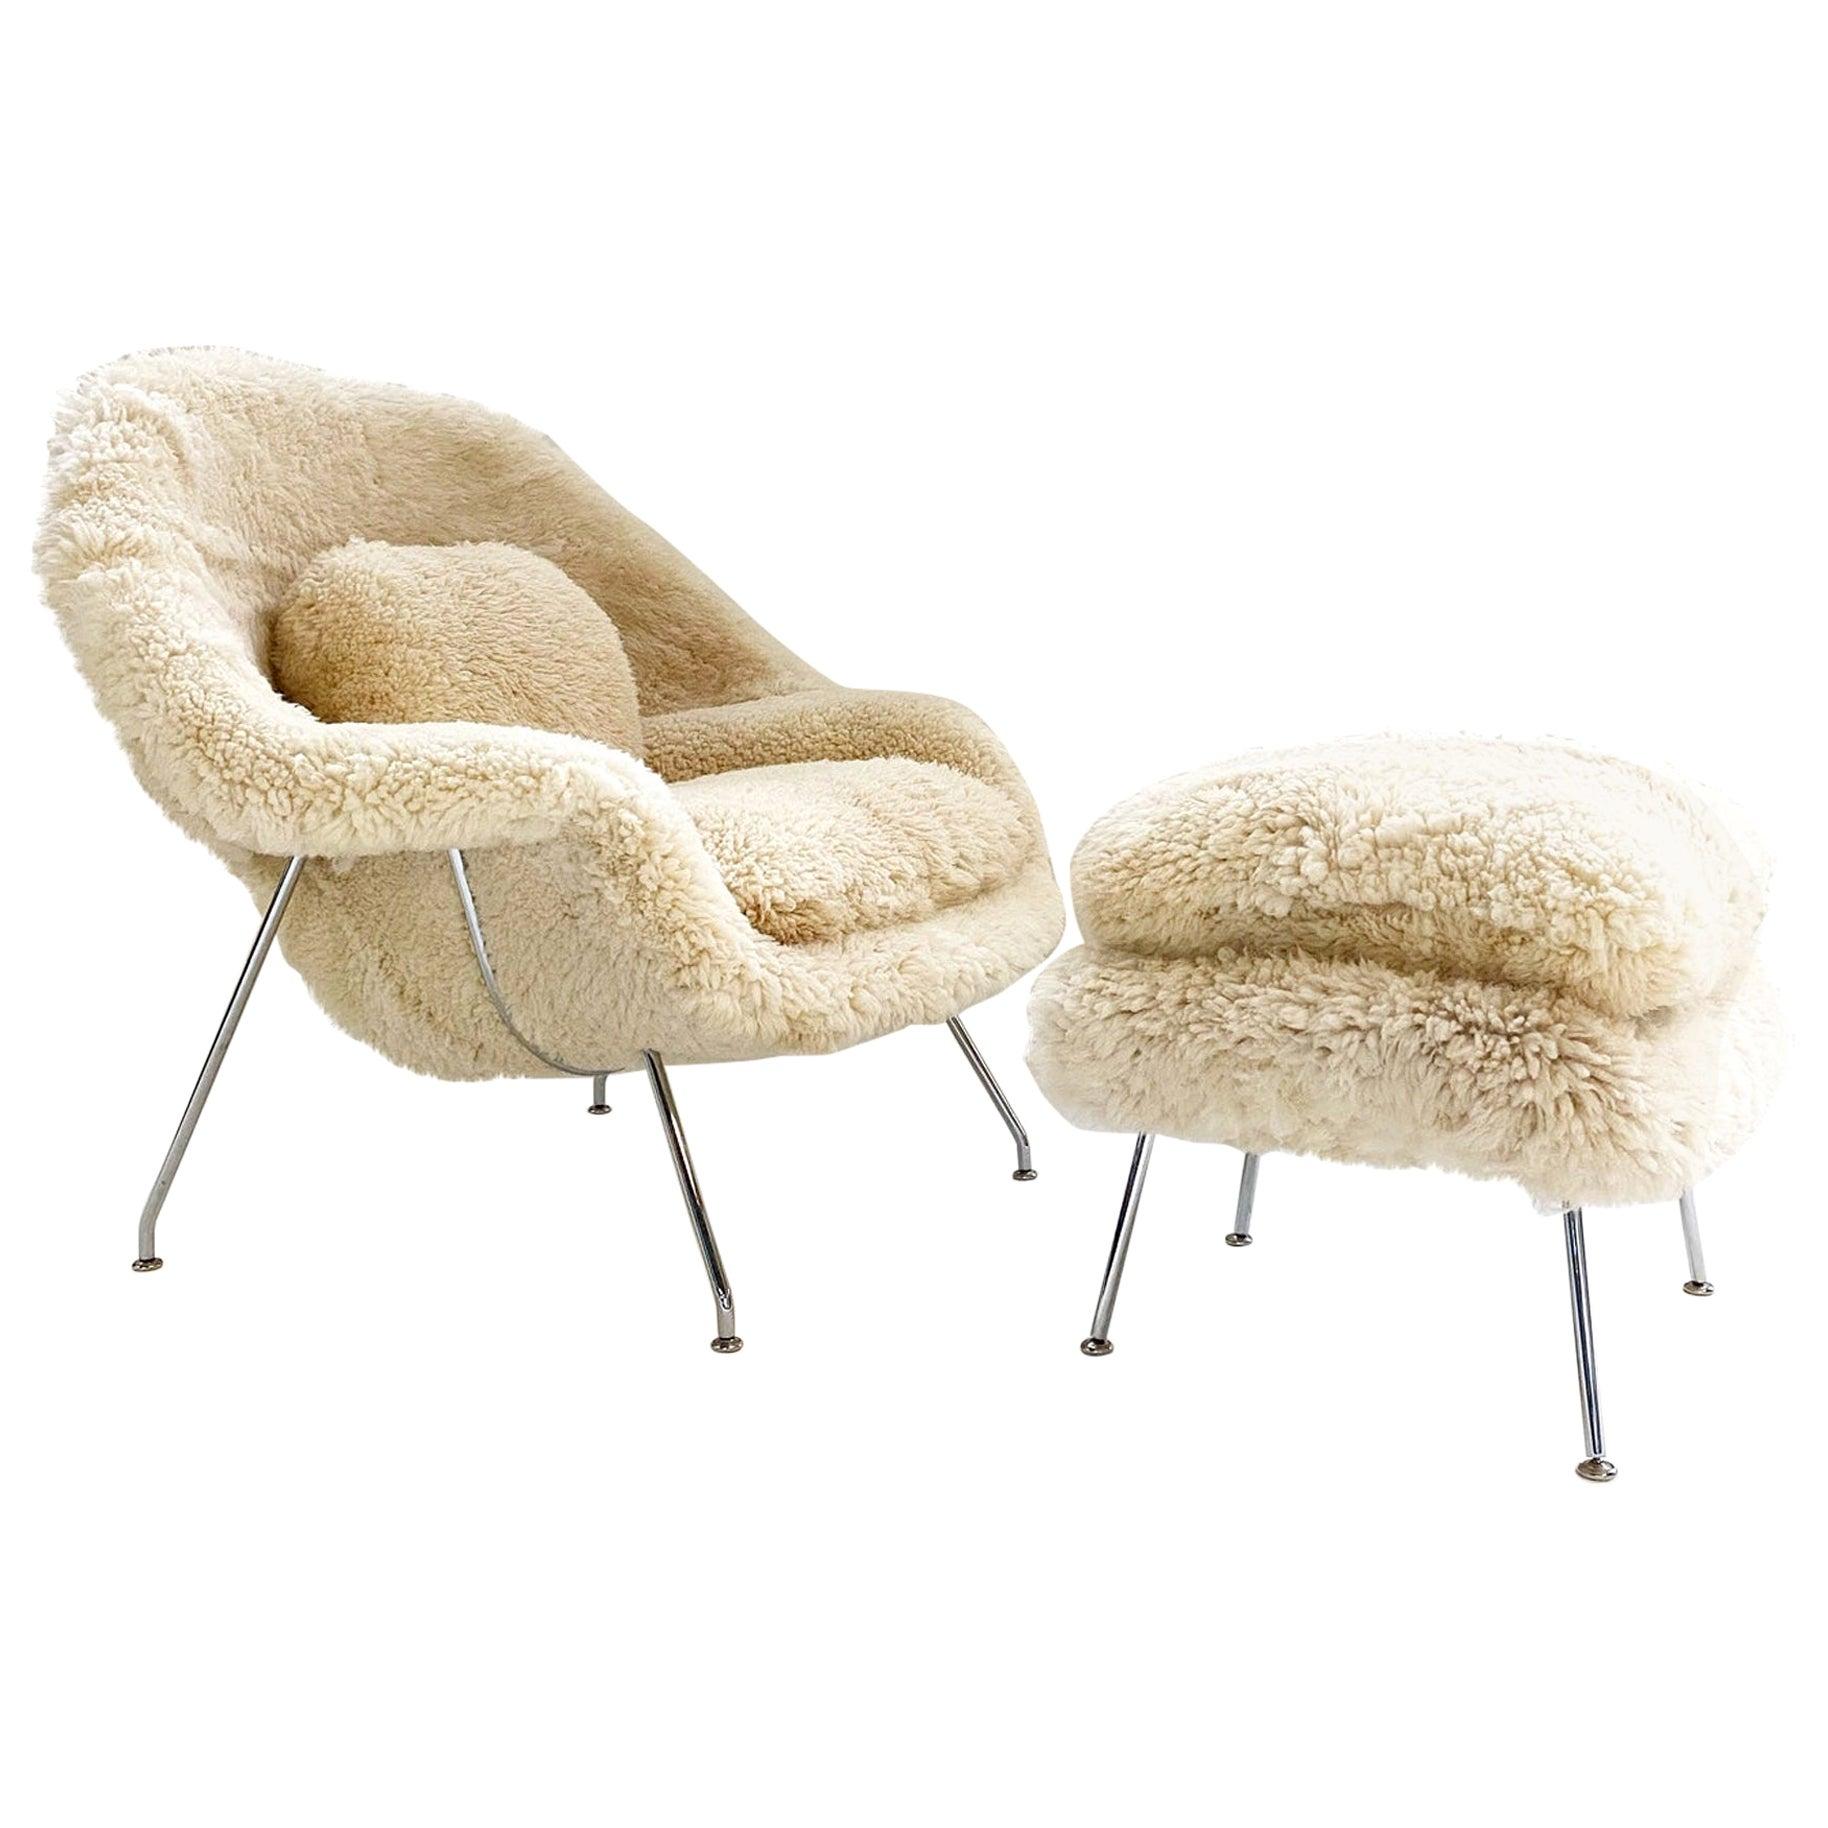 Bespoke Eero Saarinen Womb Chair Without Ottoman in California Sheepskin